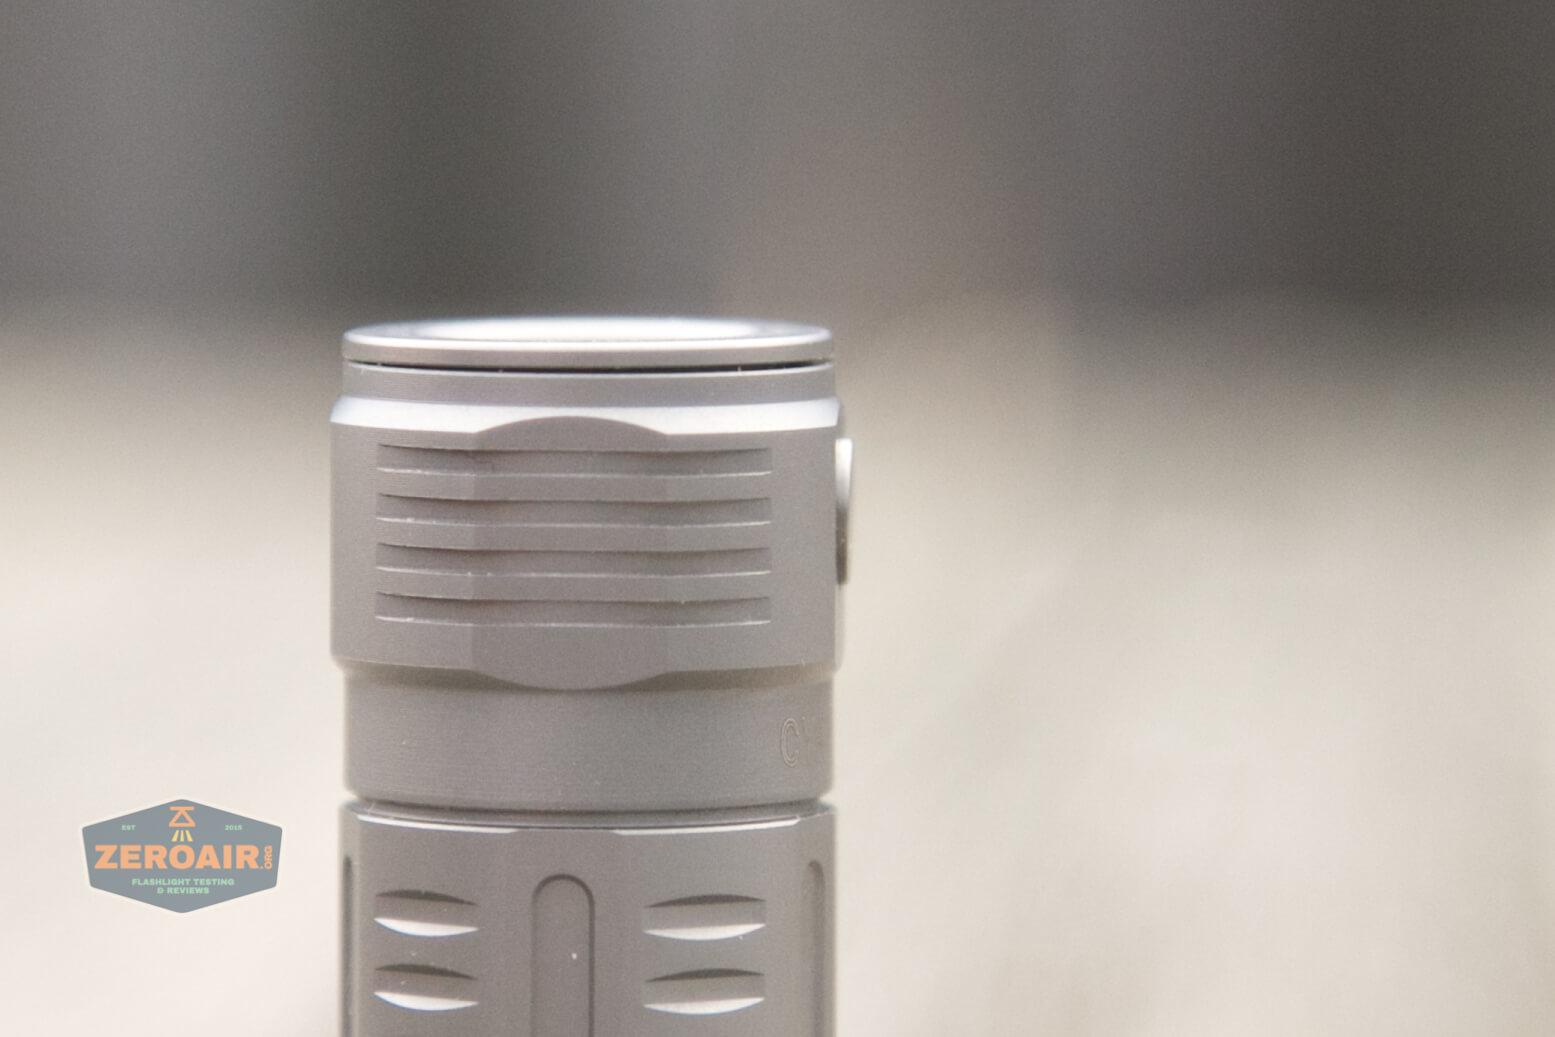 freasygears cyansky m3 titanium pocket flashlight switch height